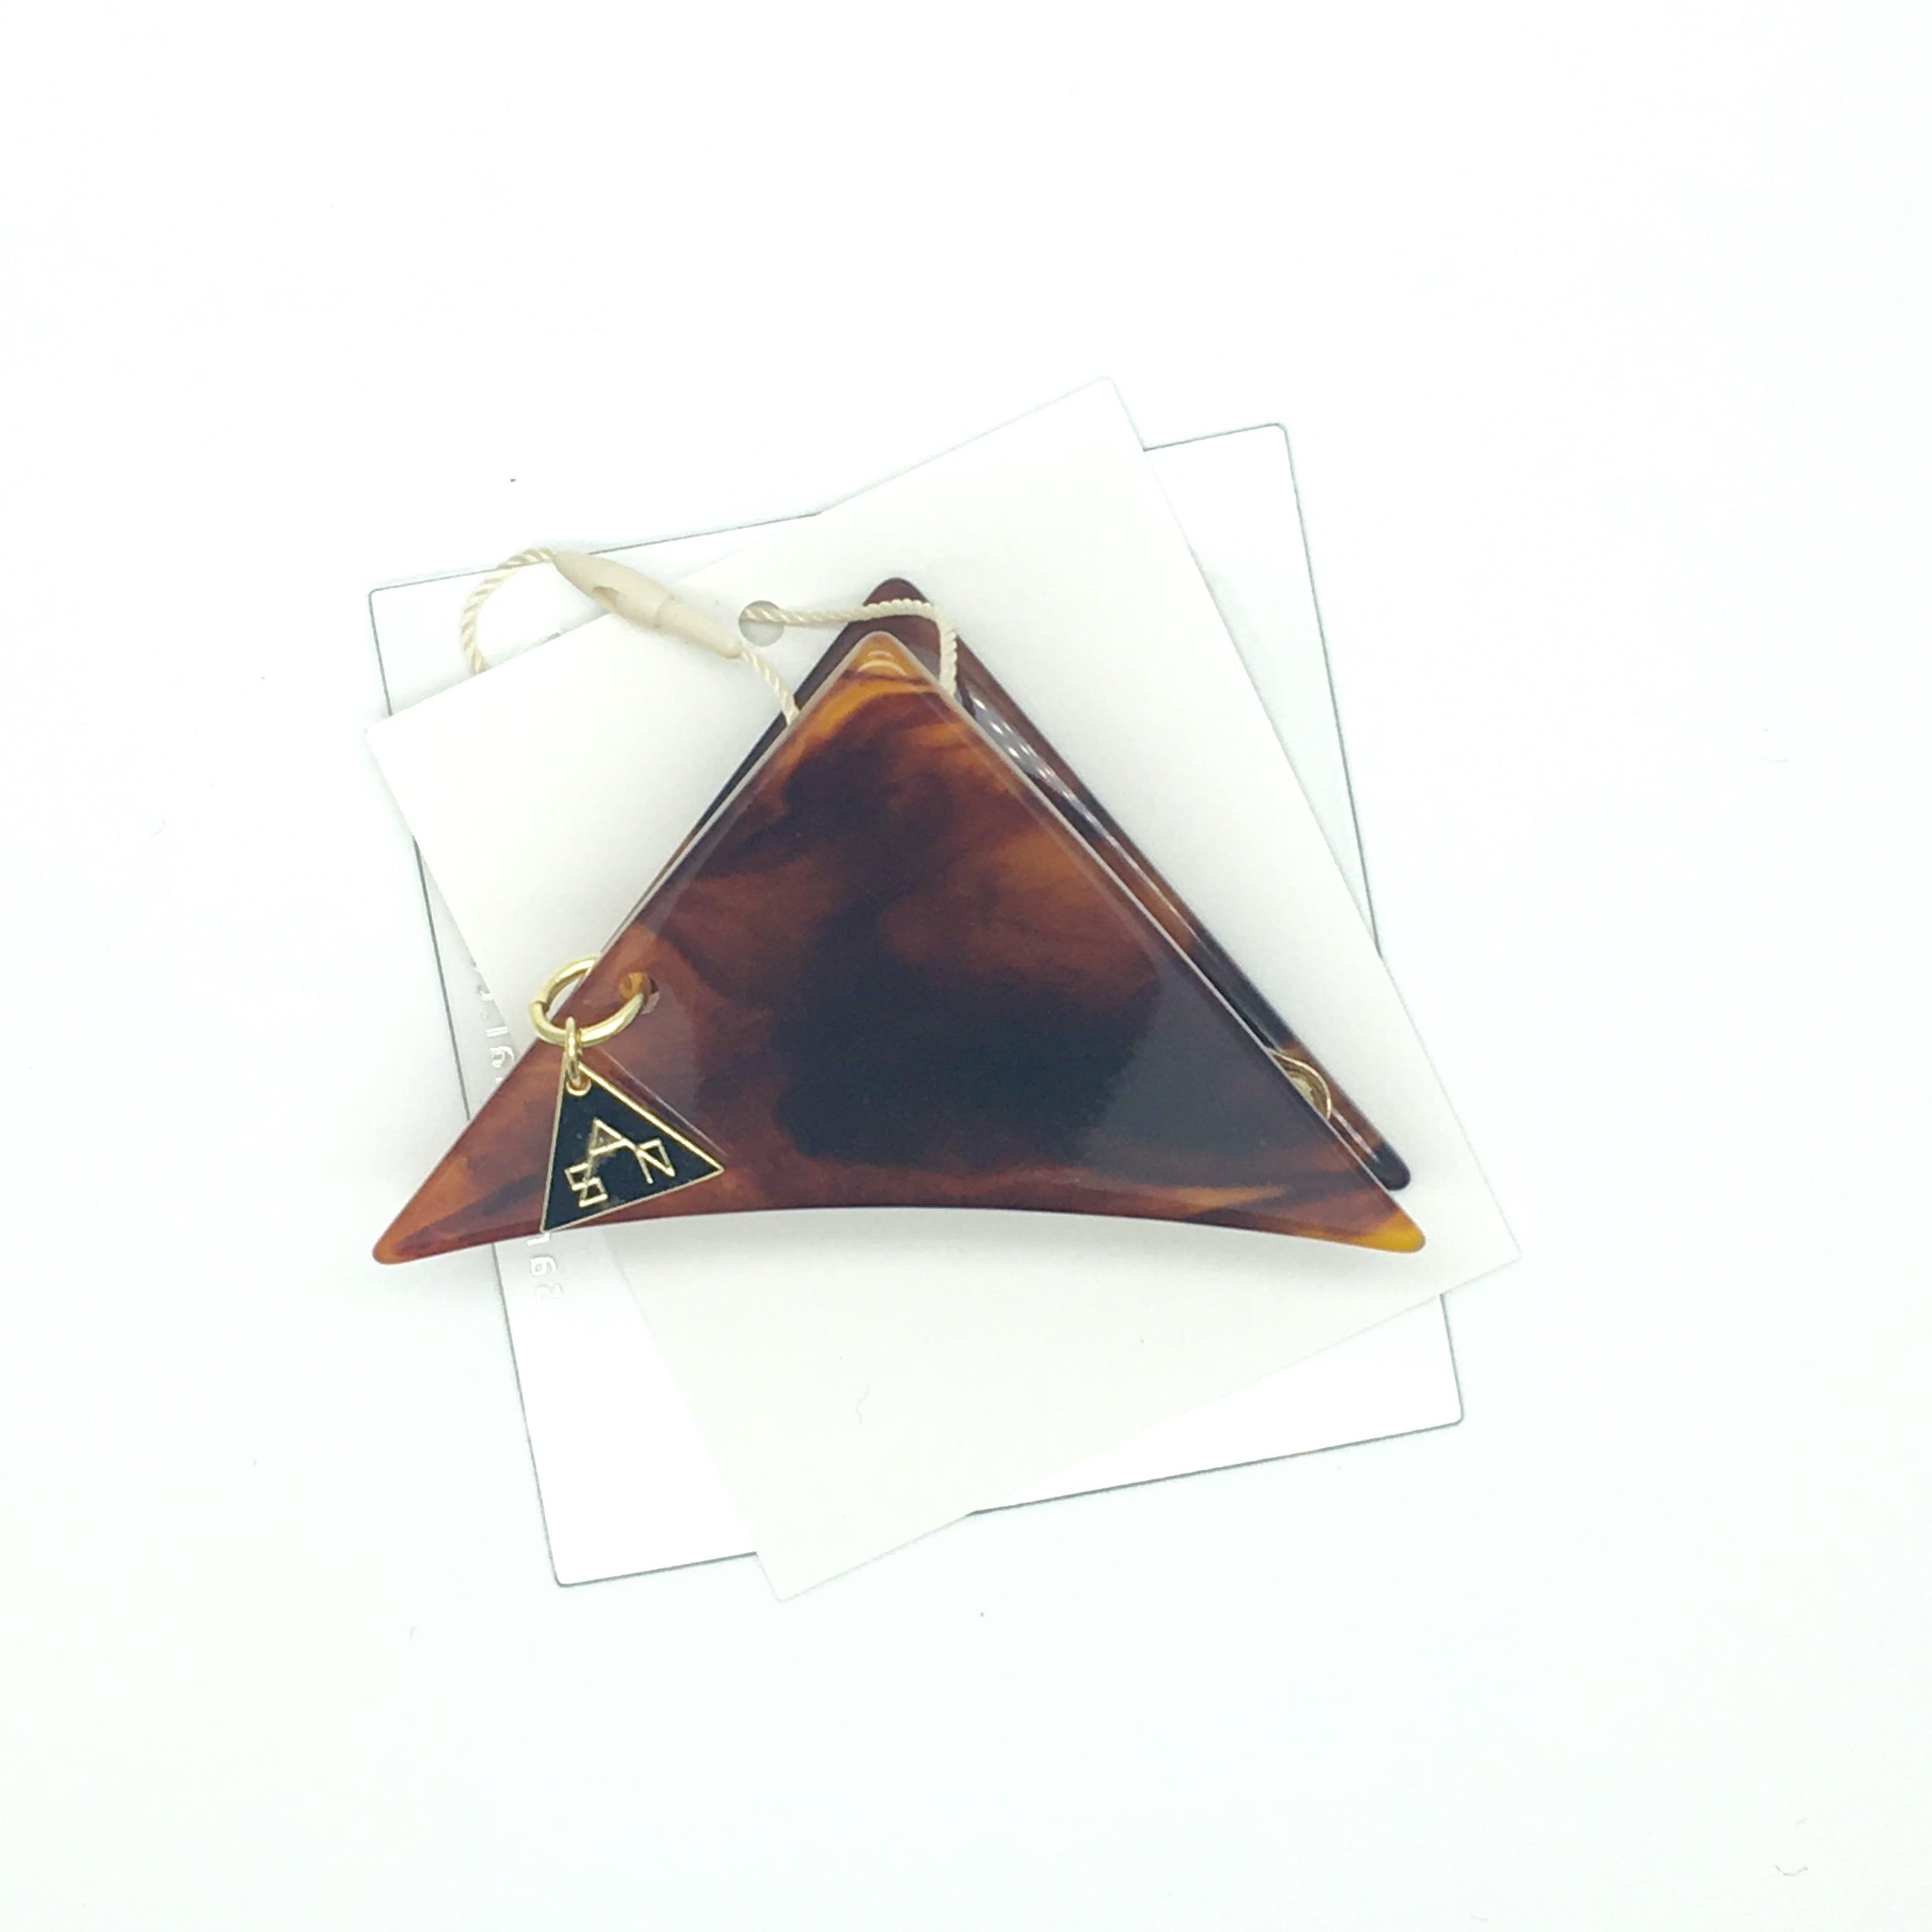 sAn 三角クリップSサイズ べっこう